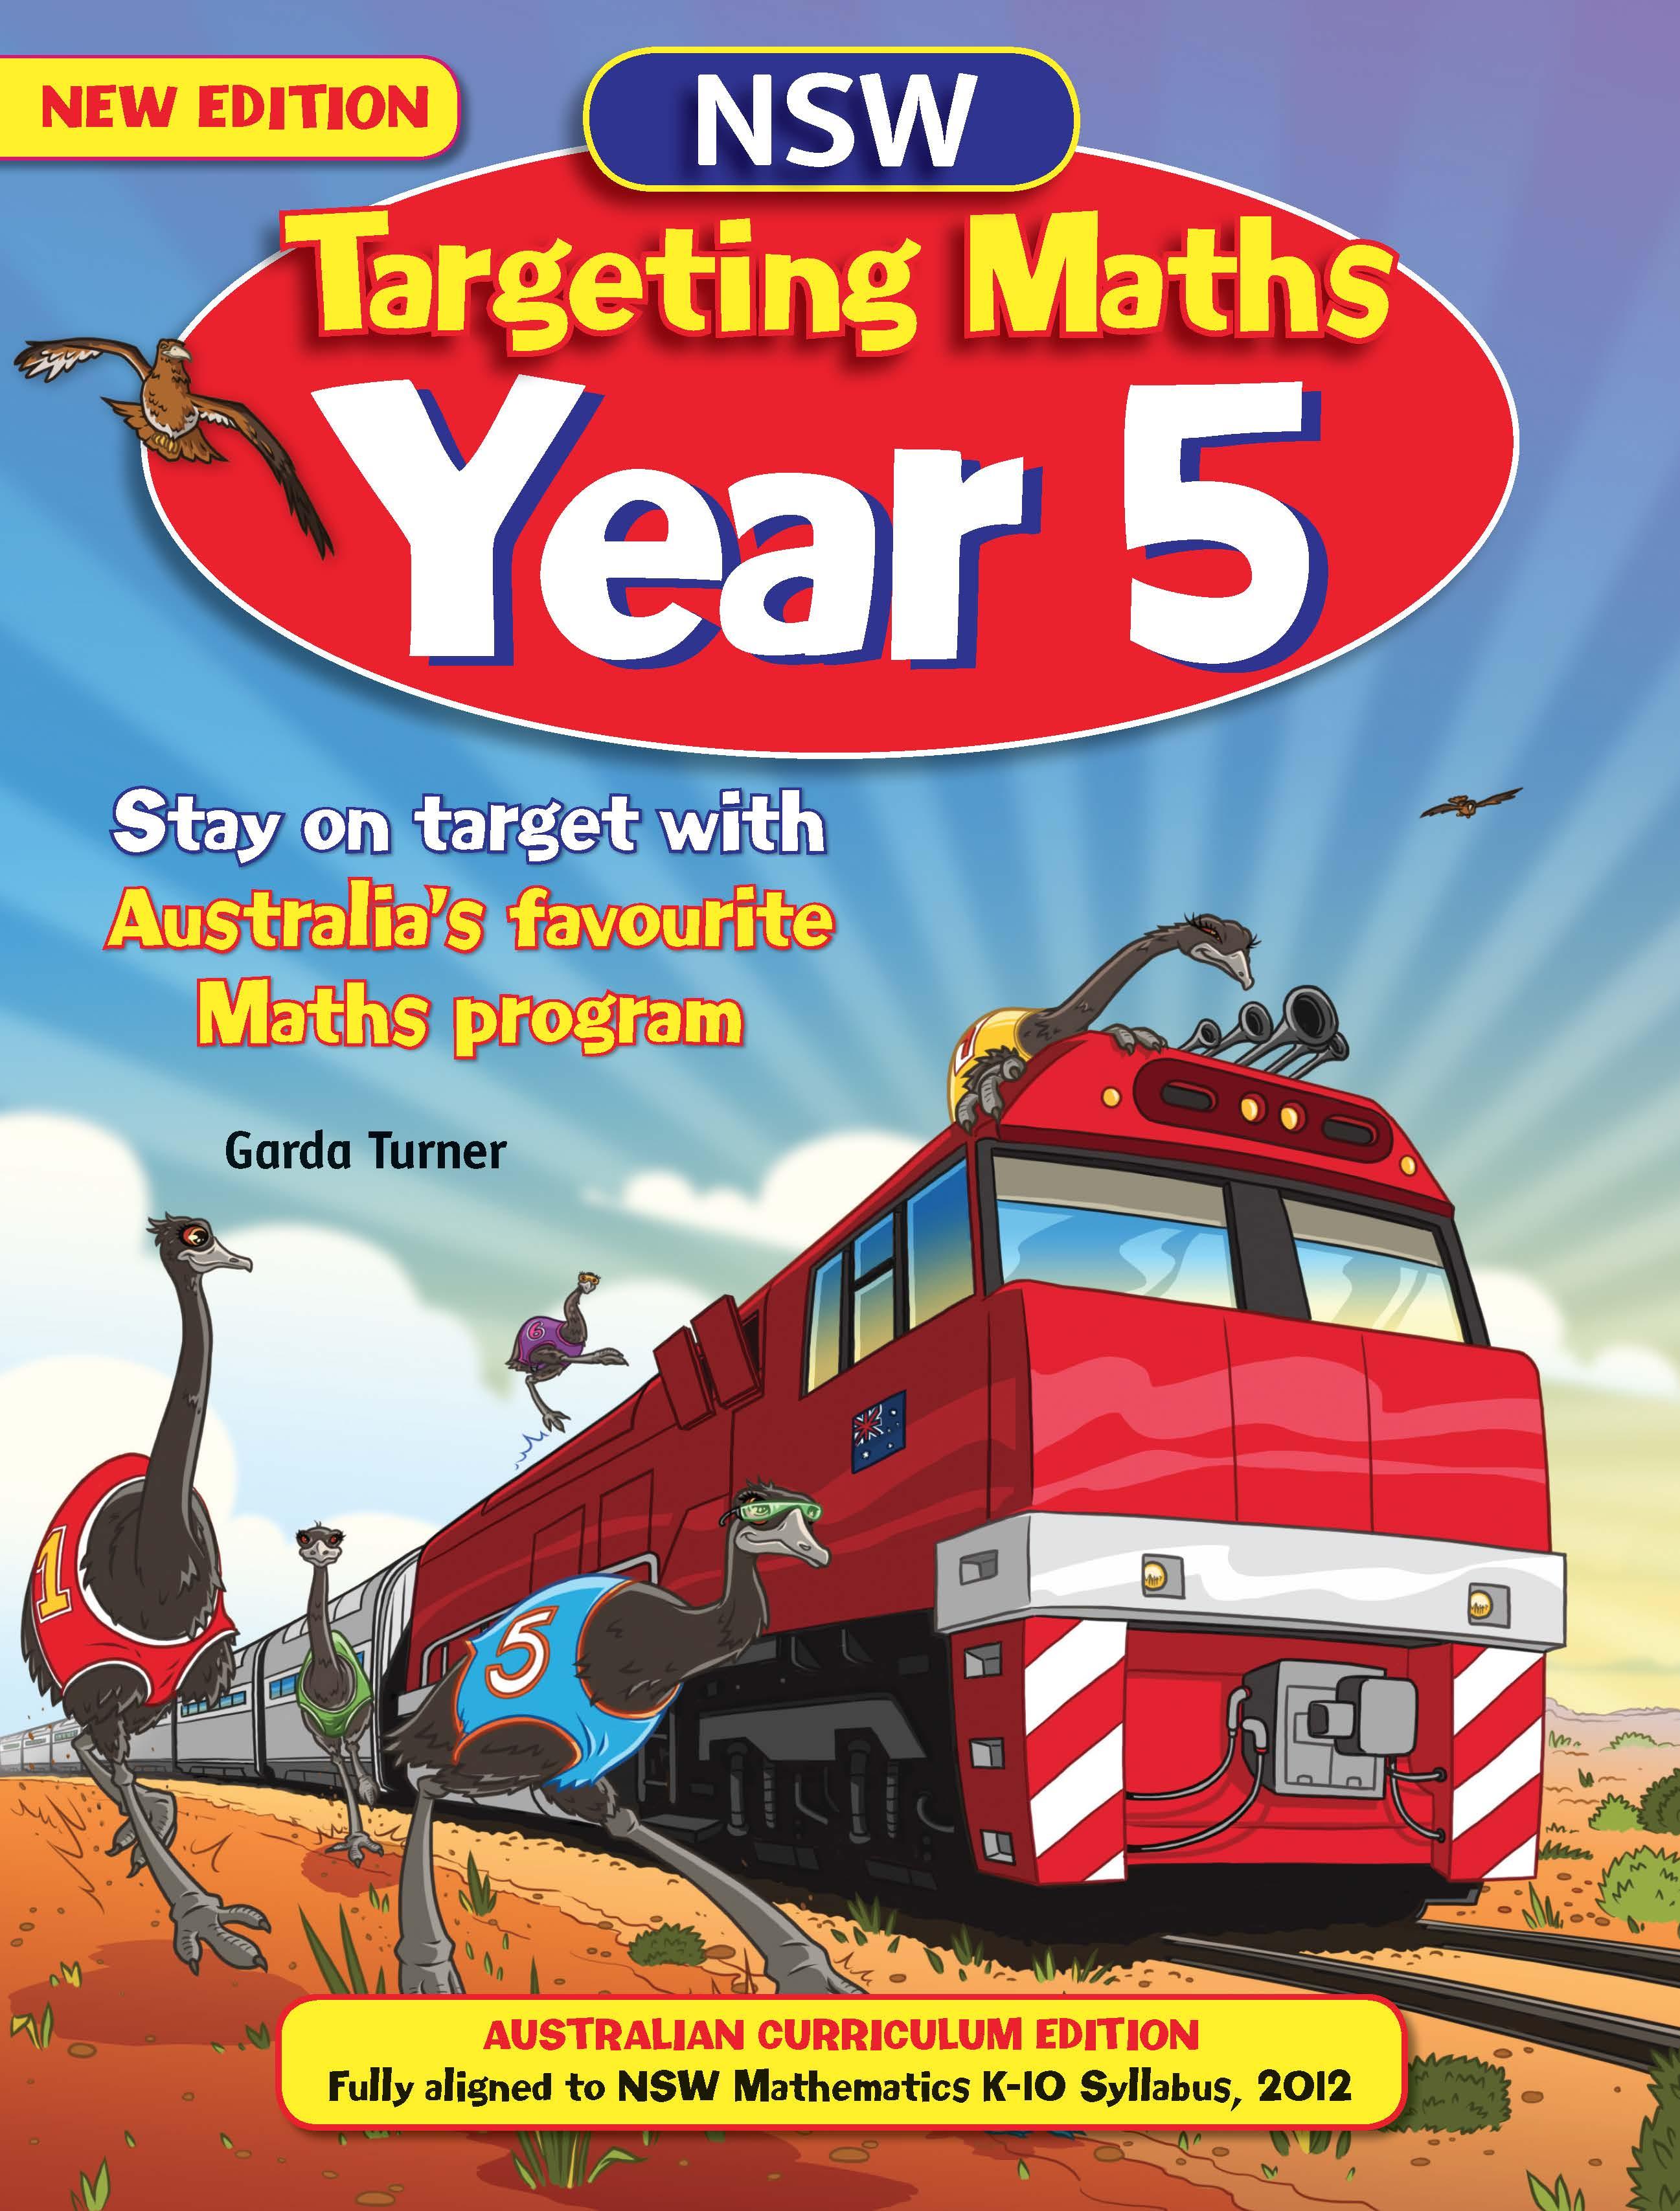 NSW Targeting Maths Australian Curriculum Edition Student Book Year 5